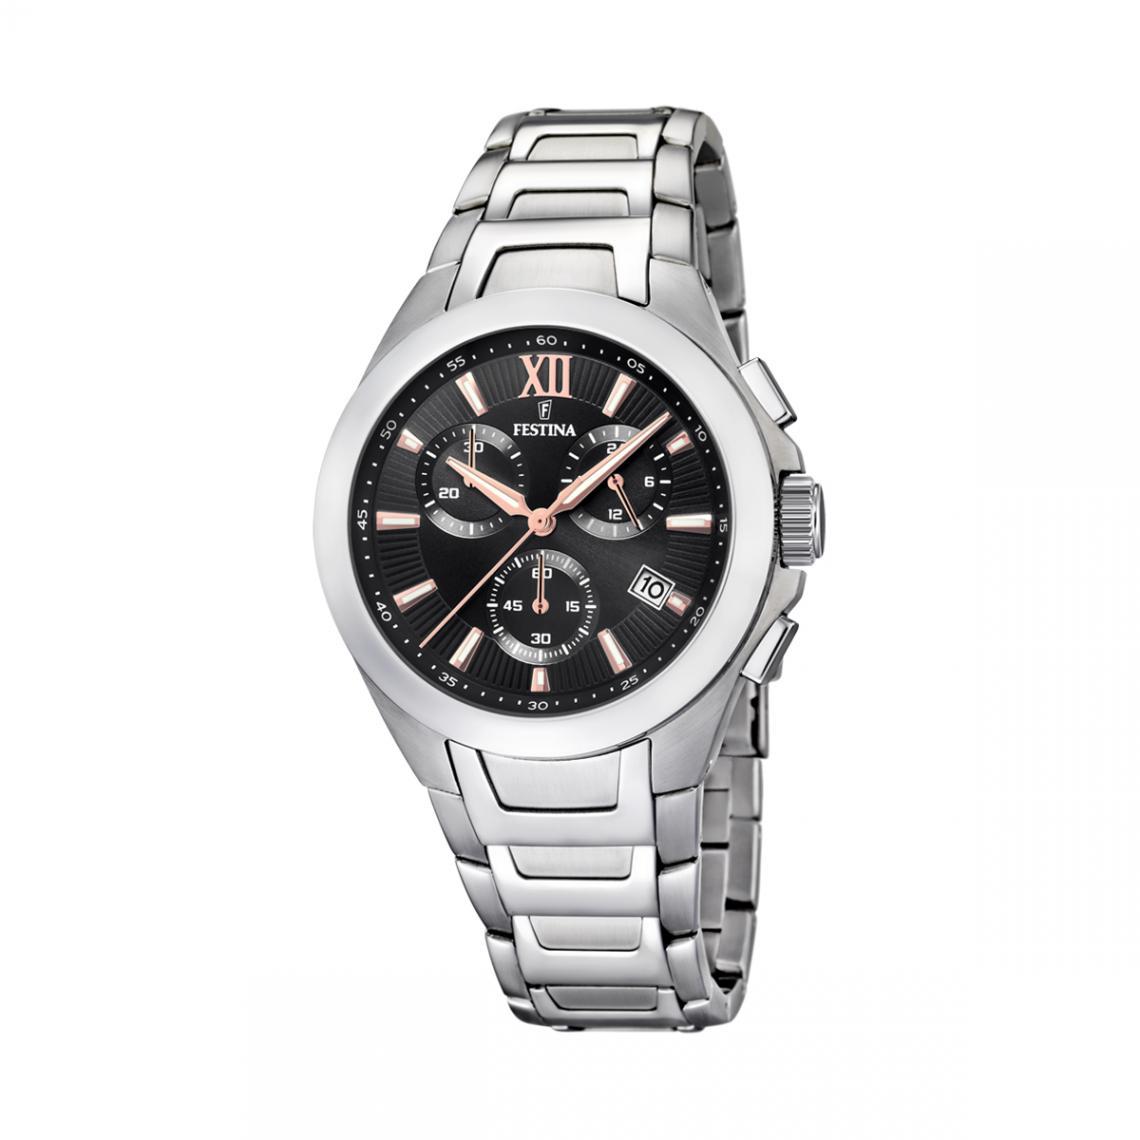 Promo : Montre Timeless Chronographe F16678-C - Montre Chronographe Dateur Acier Montres - Festina - Modalova